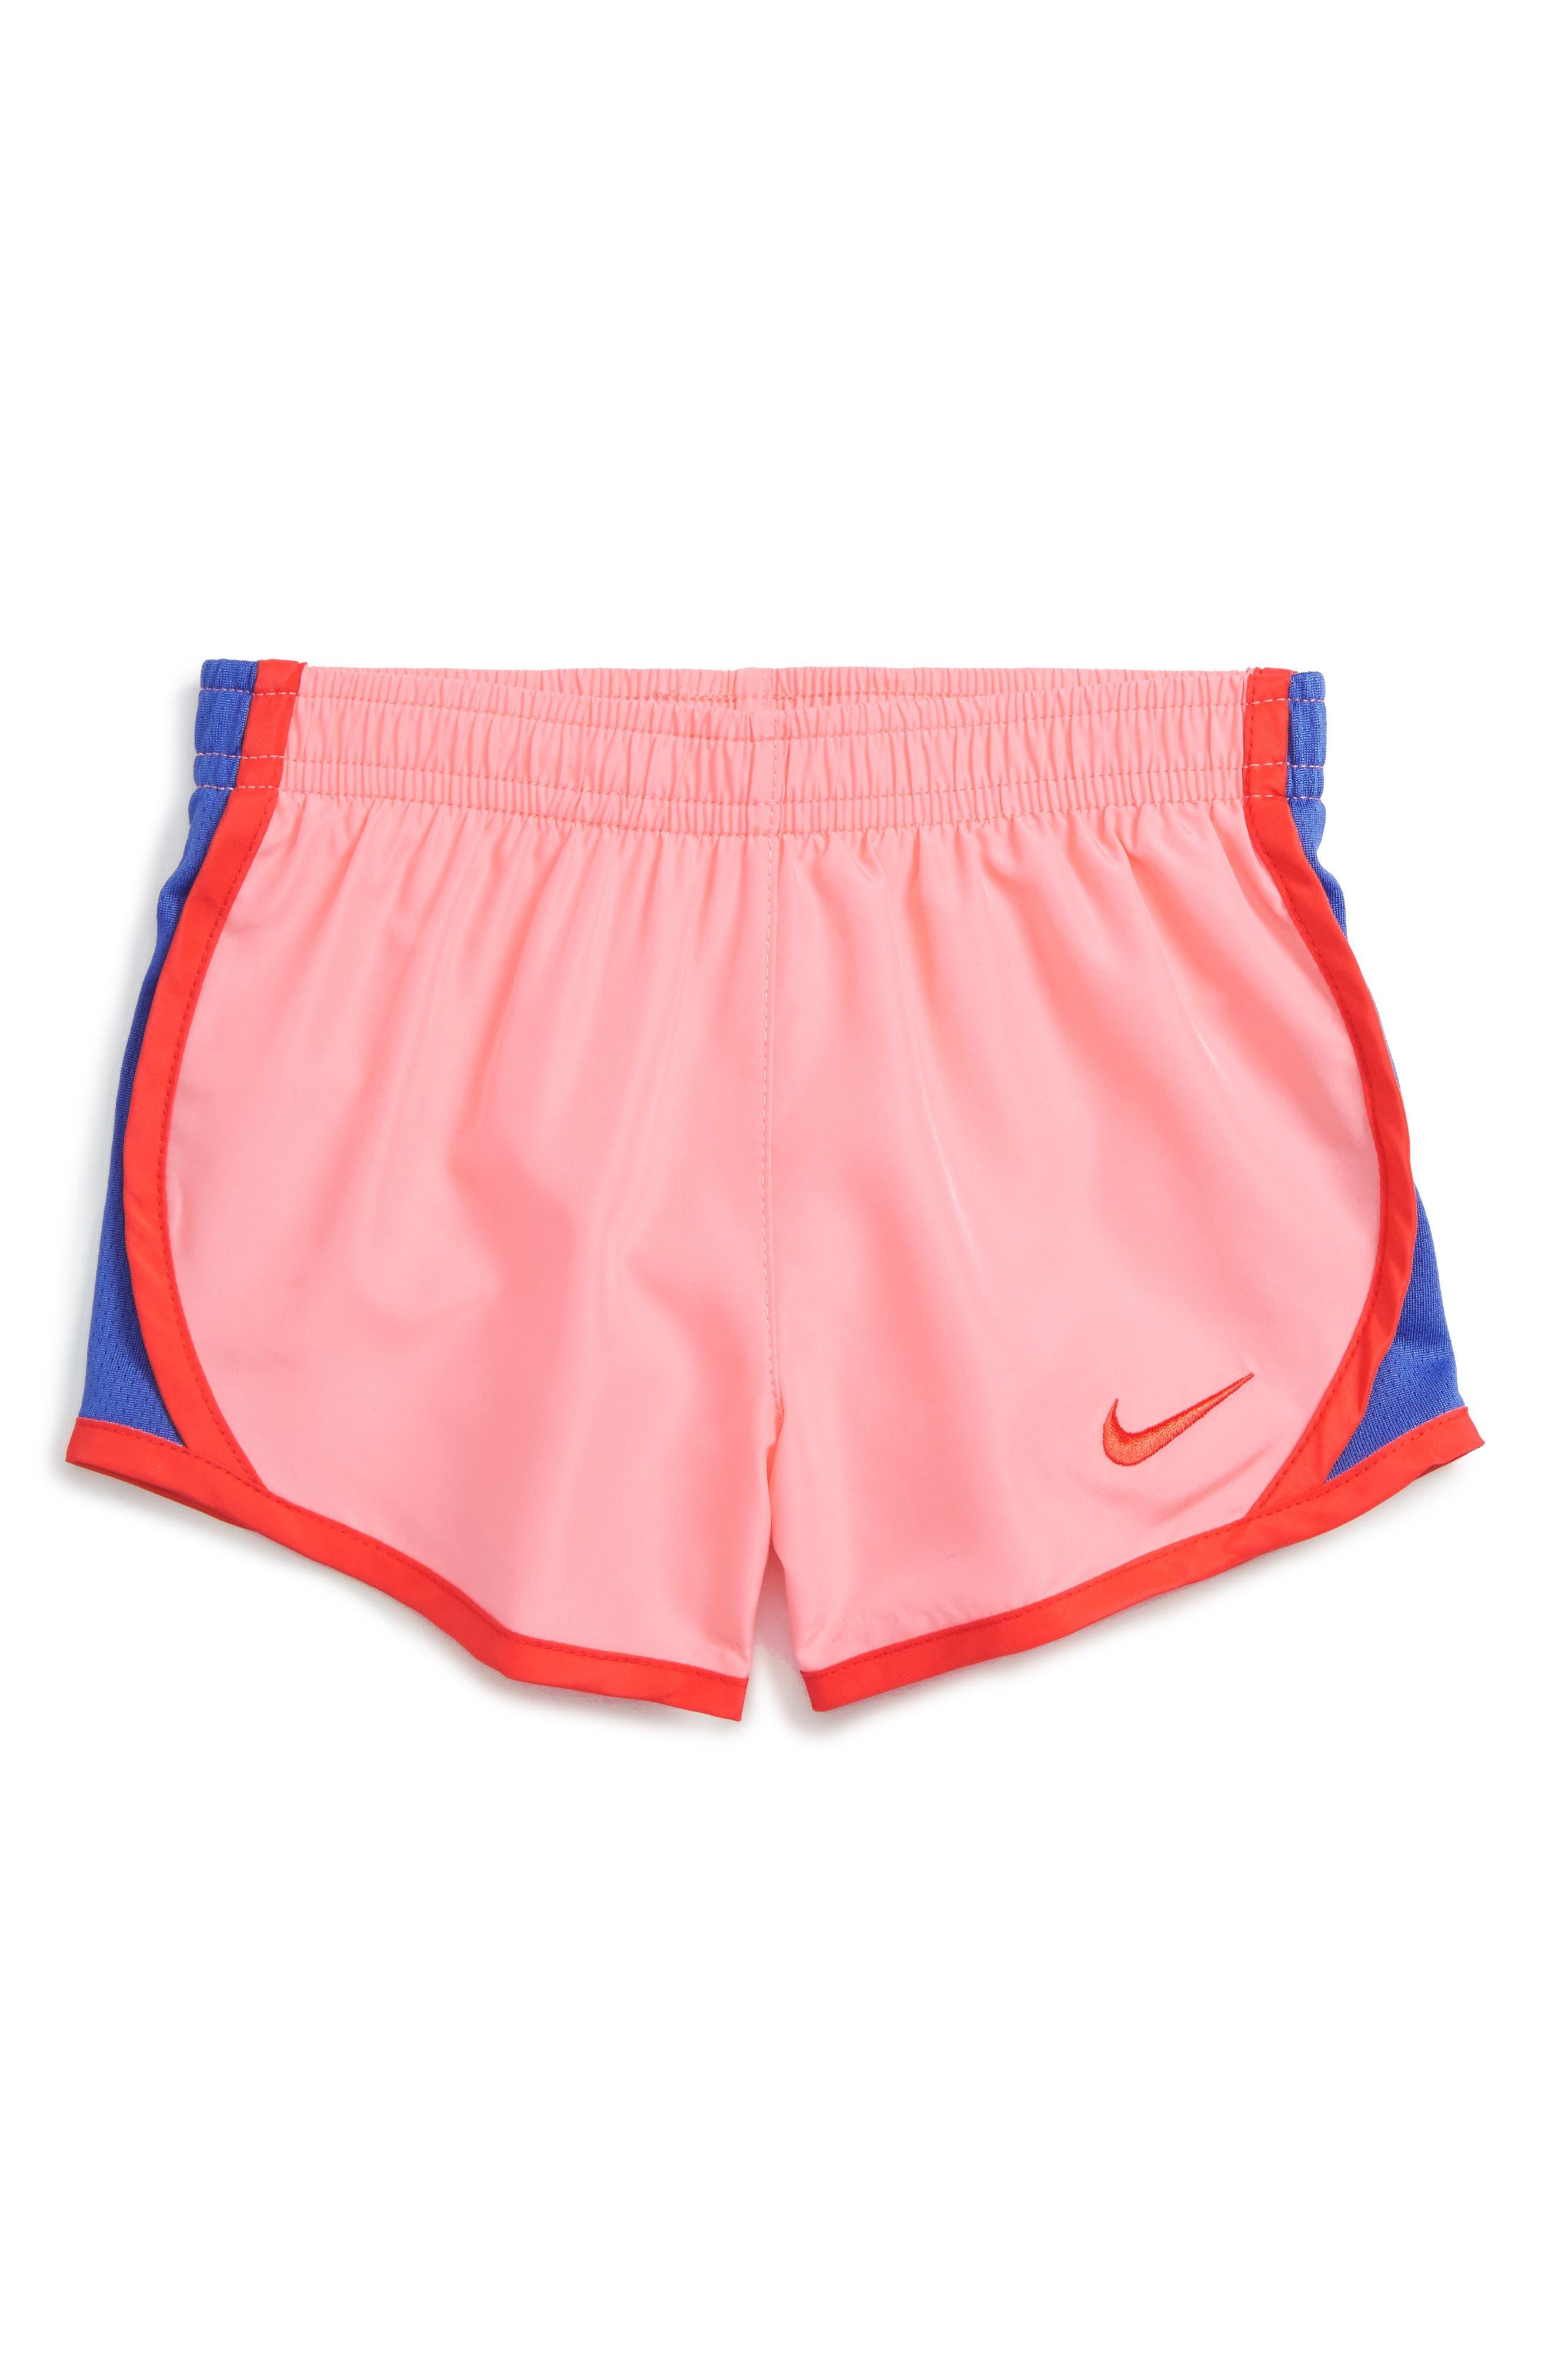 Alternate Image 1 Selected - Nike Tempo Dri-FIT Shorts (Toddler Girls & Little Girls)